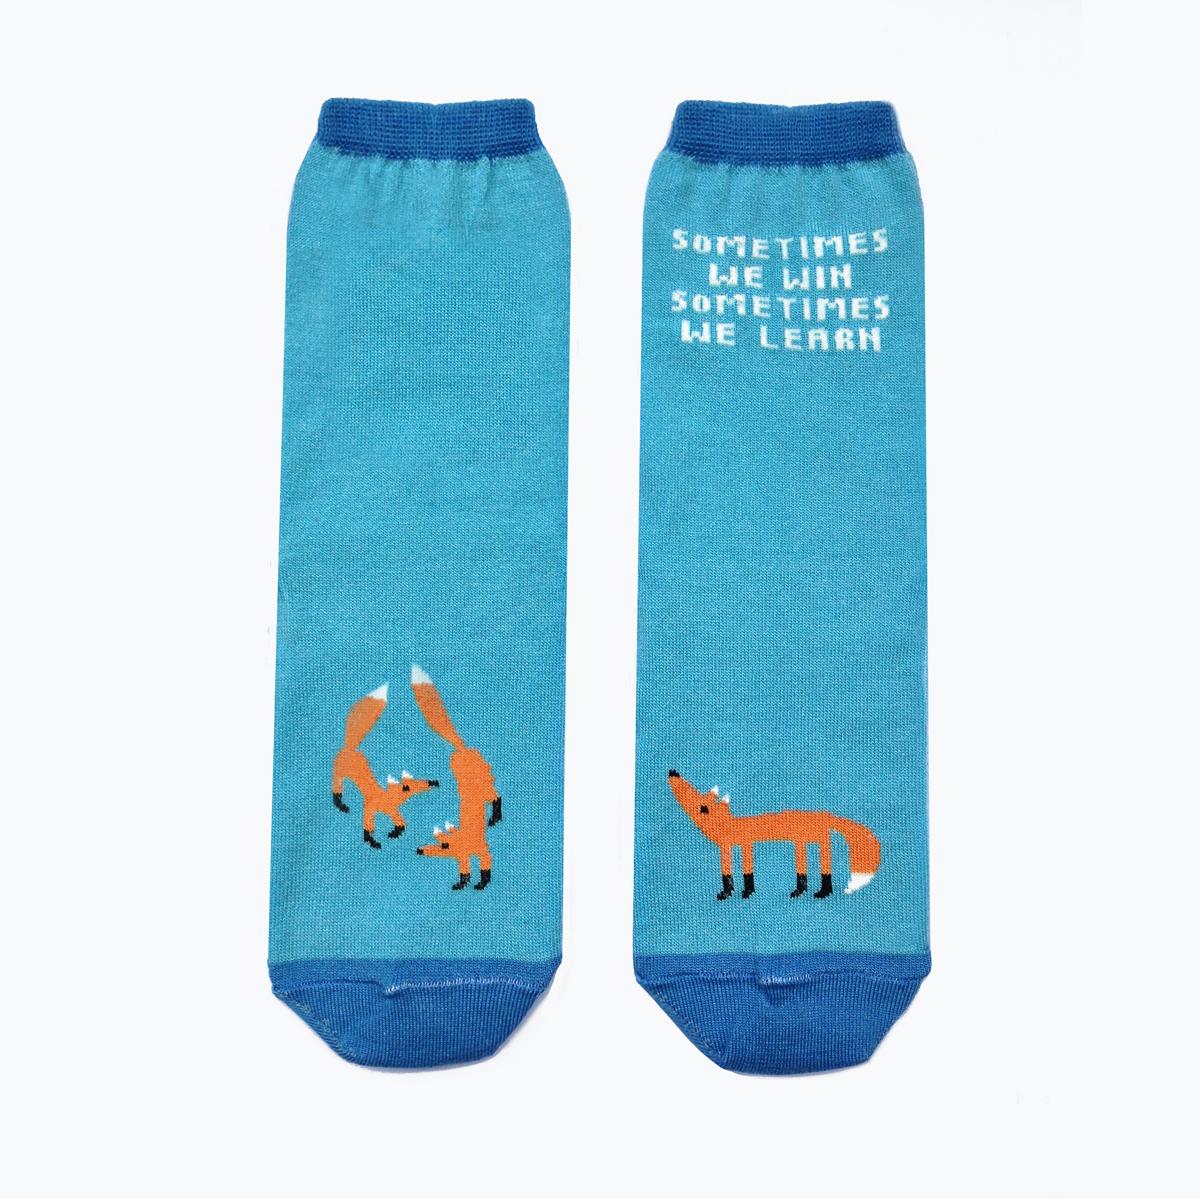 Носки женские Big Bang Socks Лиса, цвет: голубой, оранжевый. a151. Размер 35/39 носки женские big bang socks кит цвет темно синий голубой a131 размер 35 39